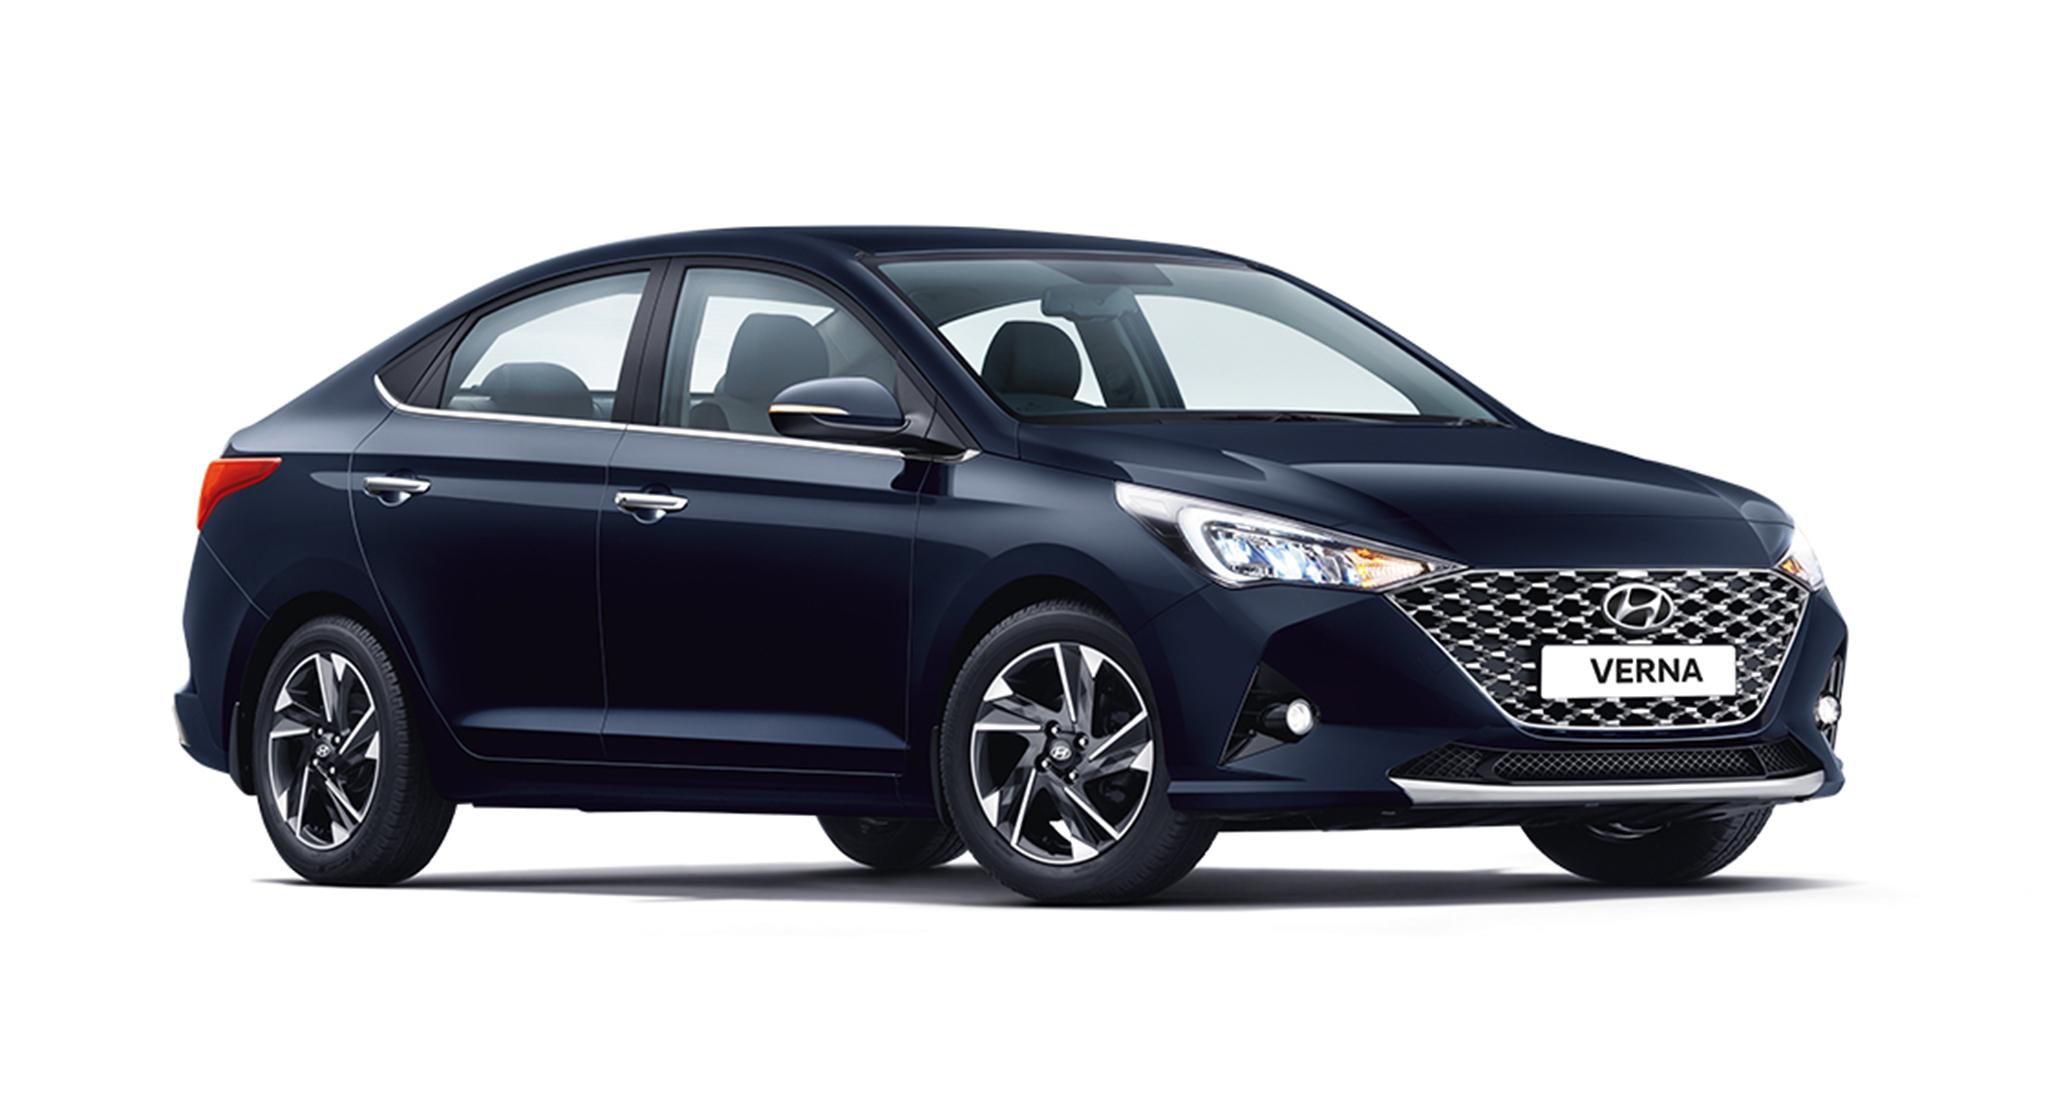 2020-hyundai-verna-facelift-front-three-quarters-r-37af.jpg